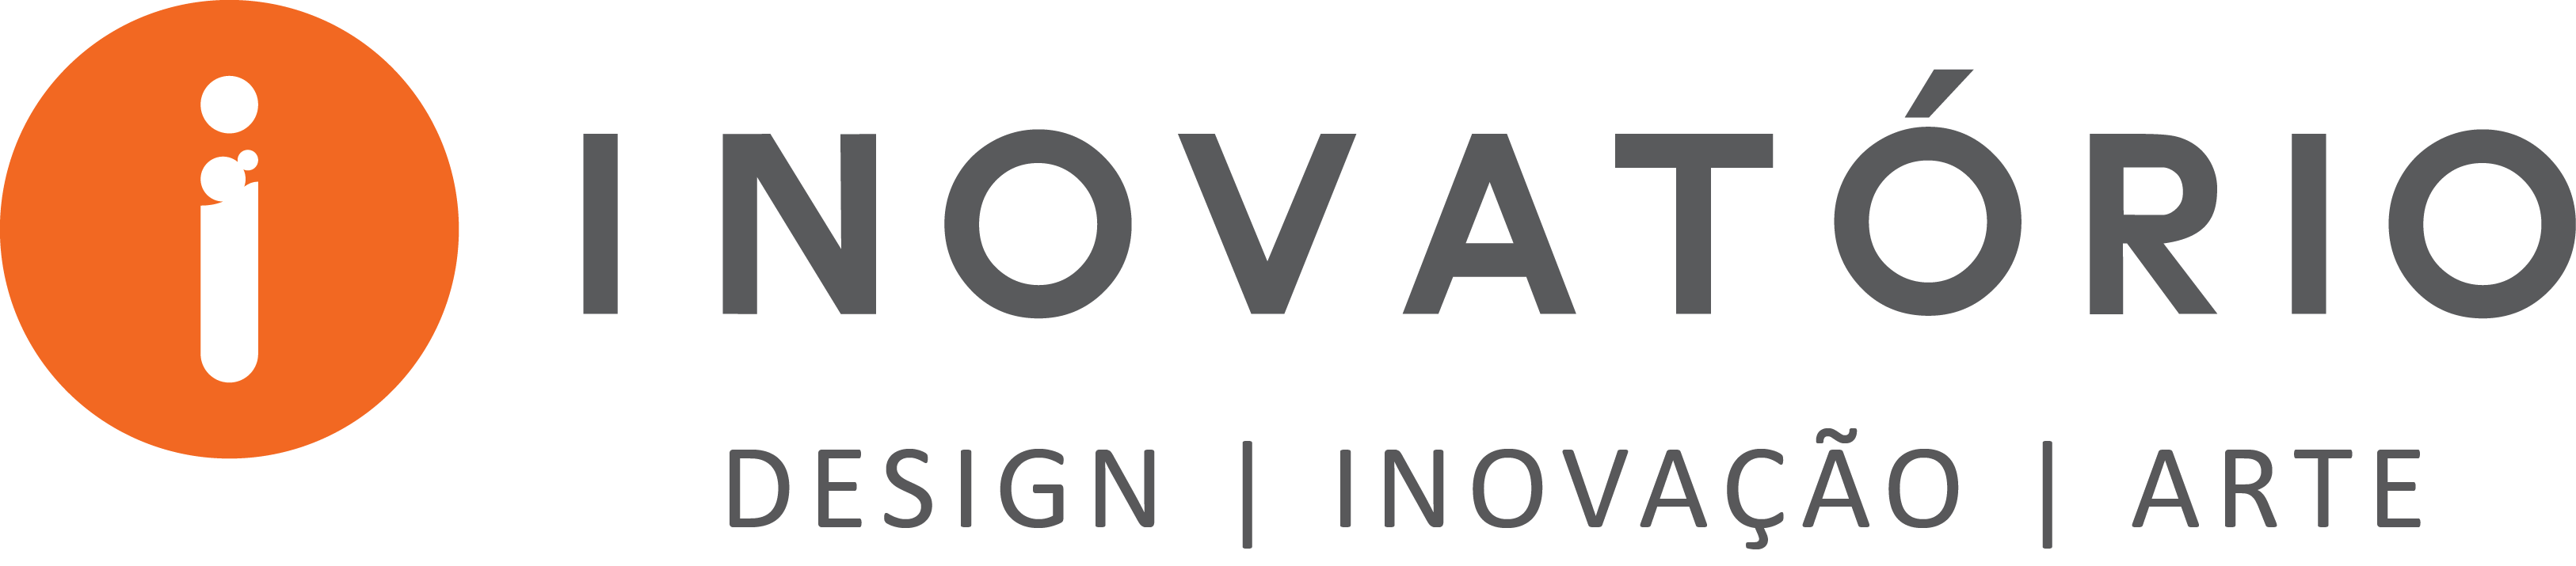 Inovatorio logo